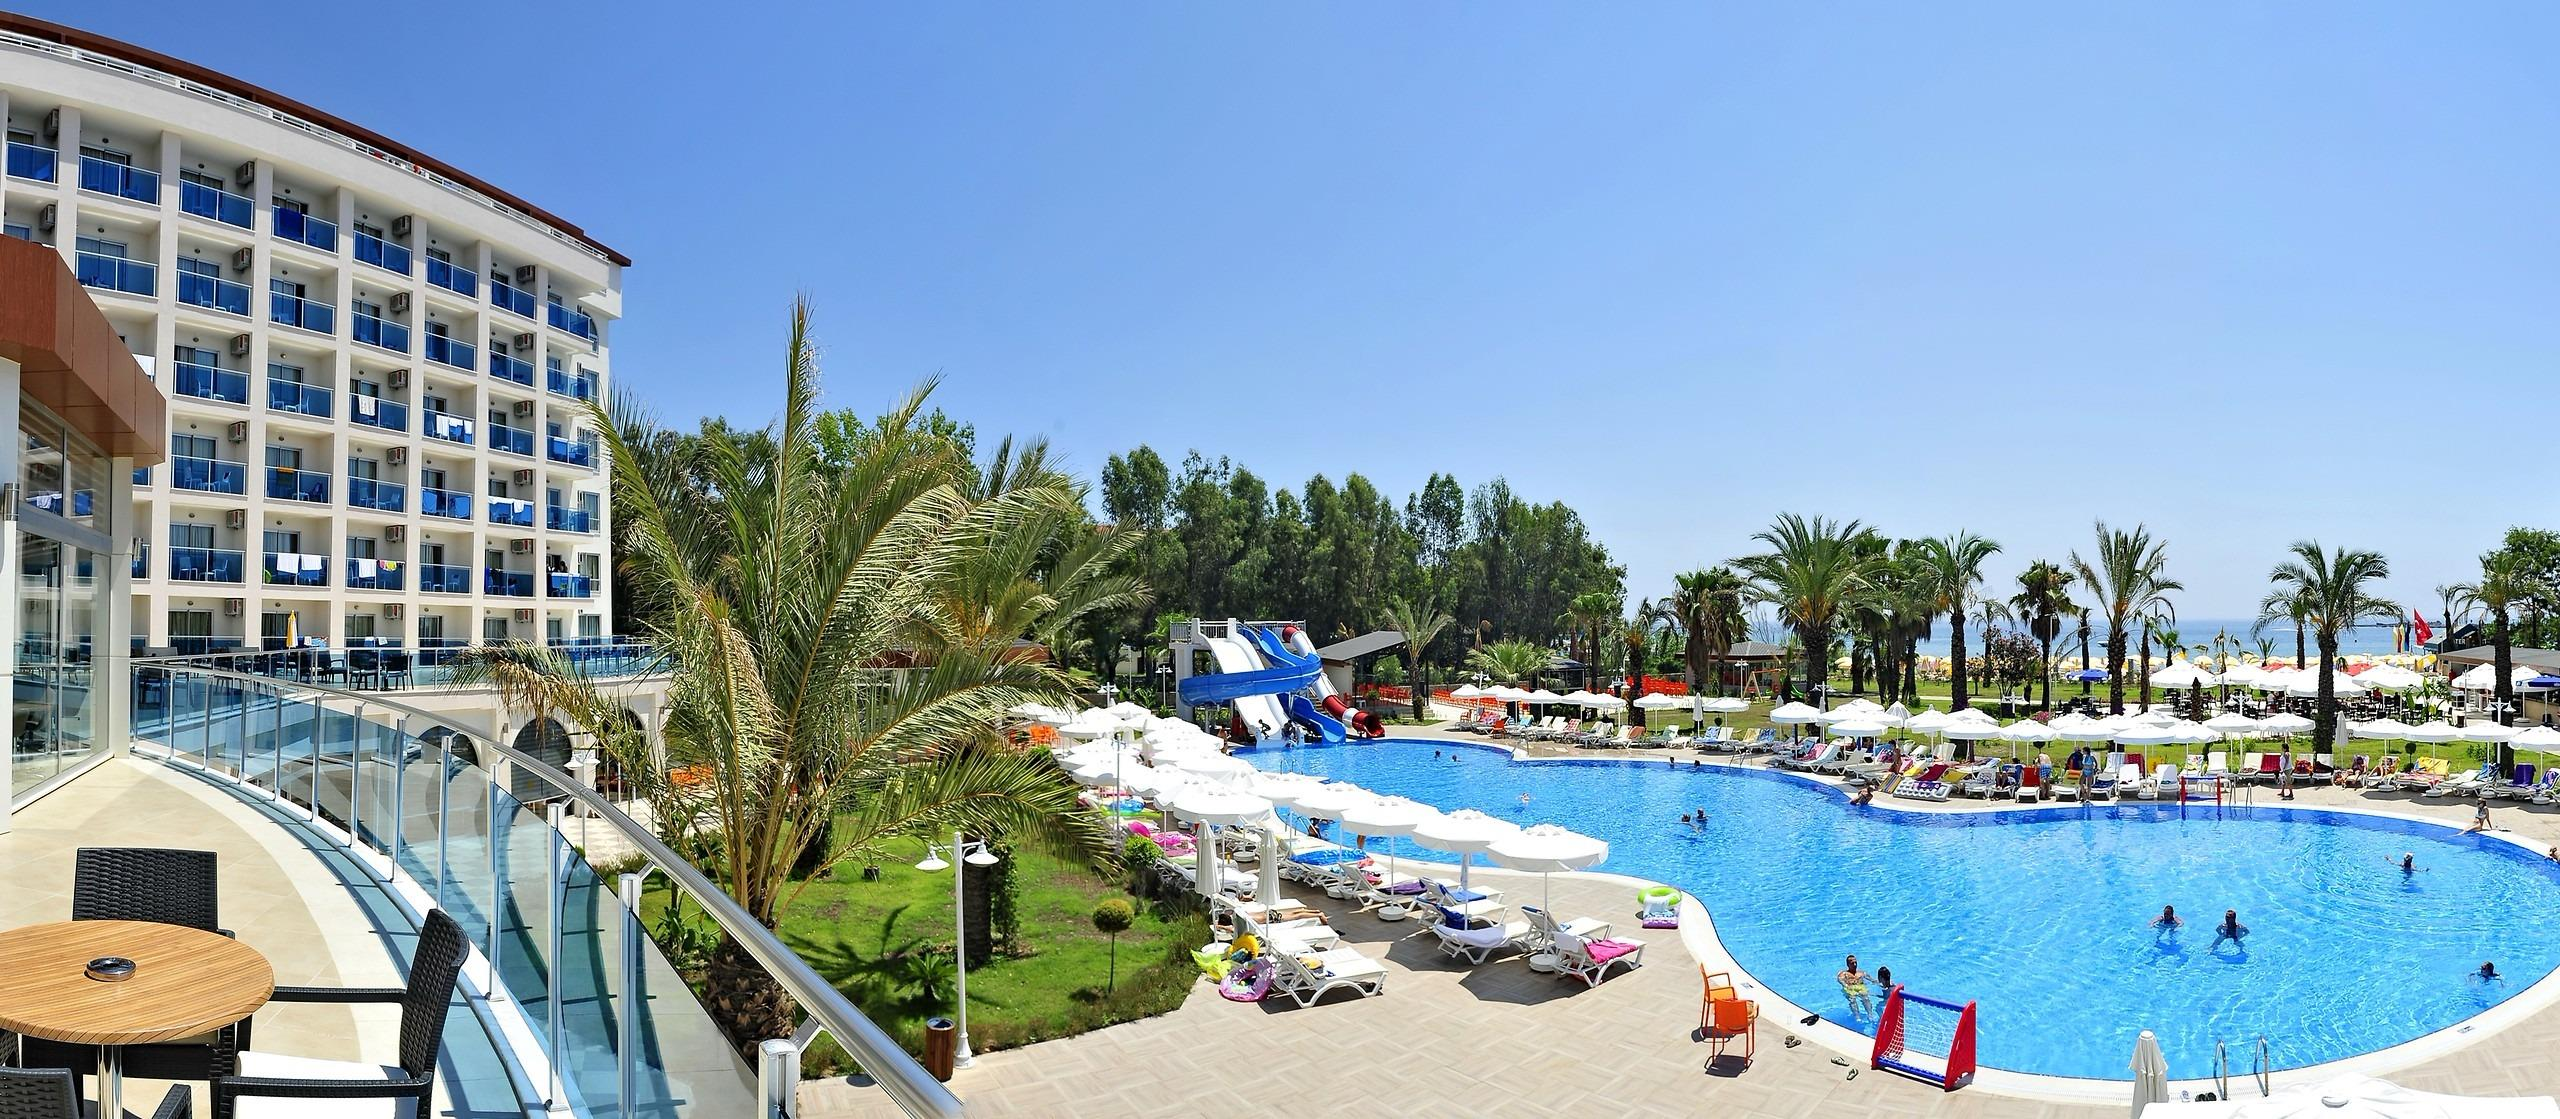 Anna Bella Diamond Hotel & Spa 5* Alanya Tour